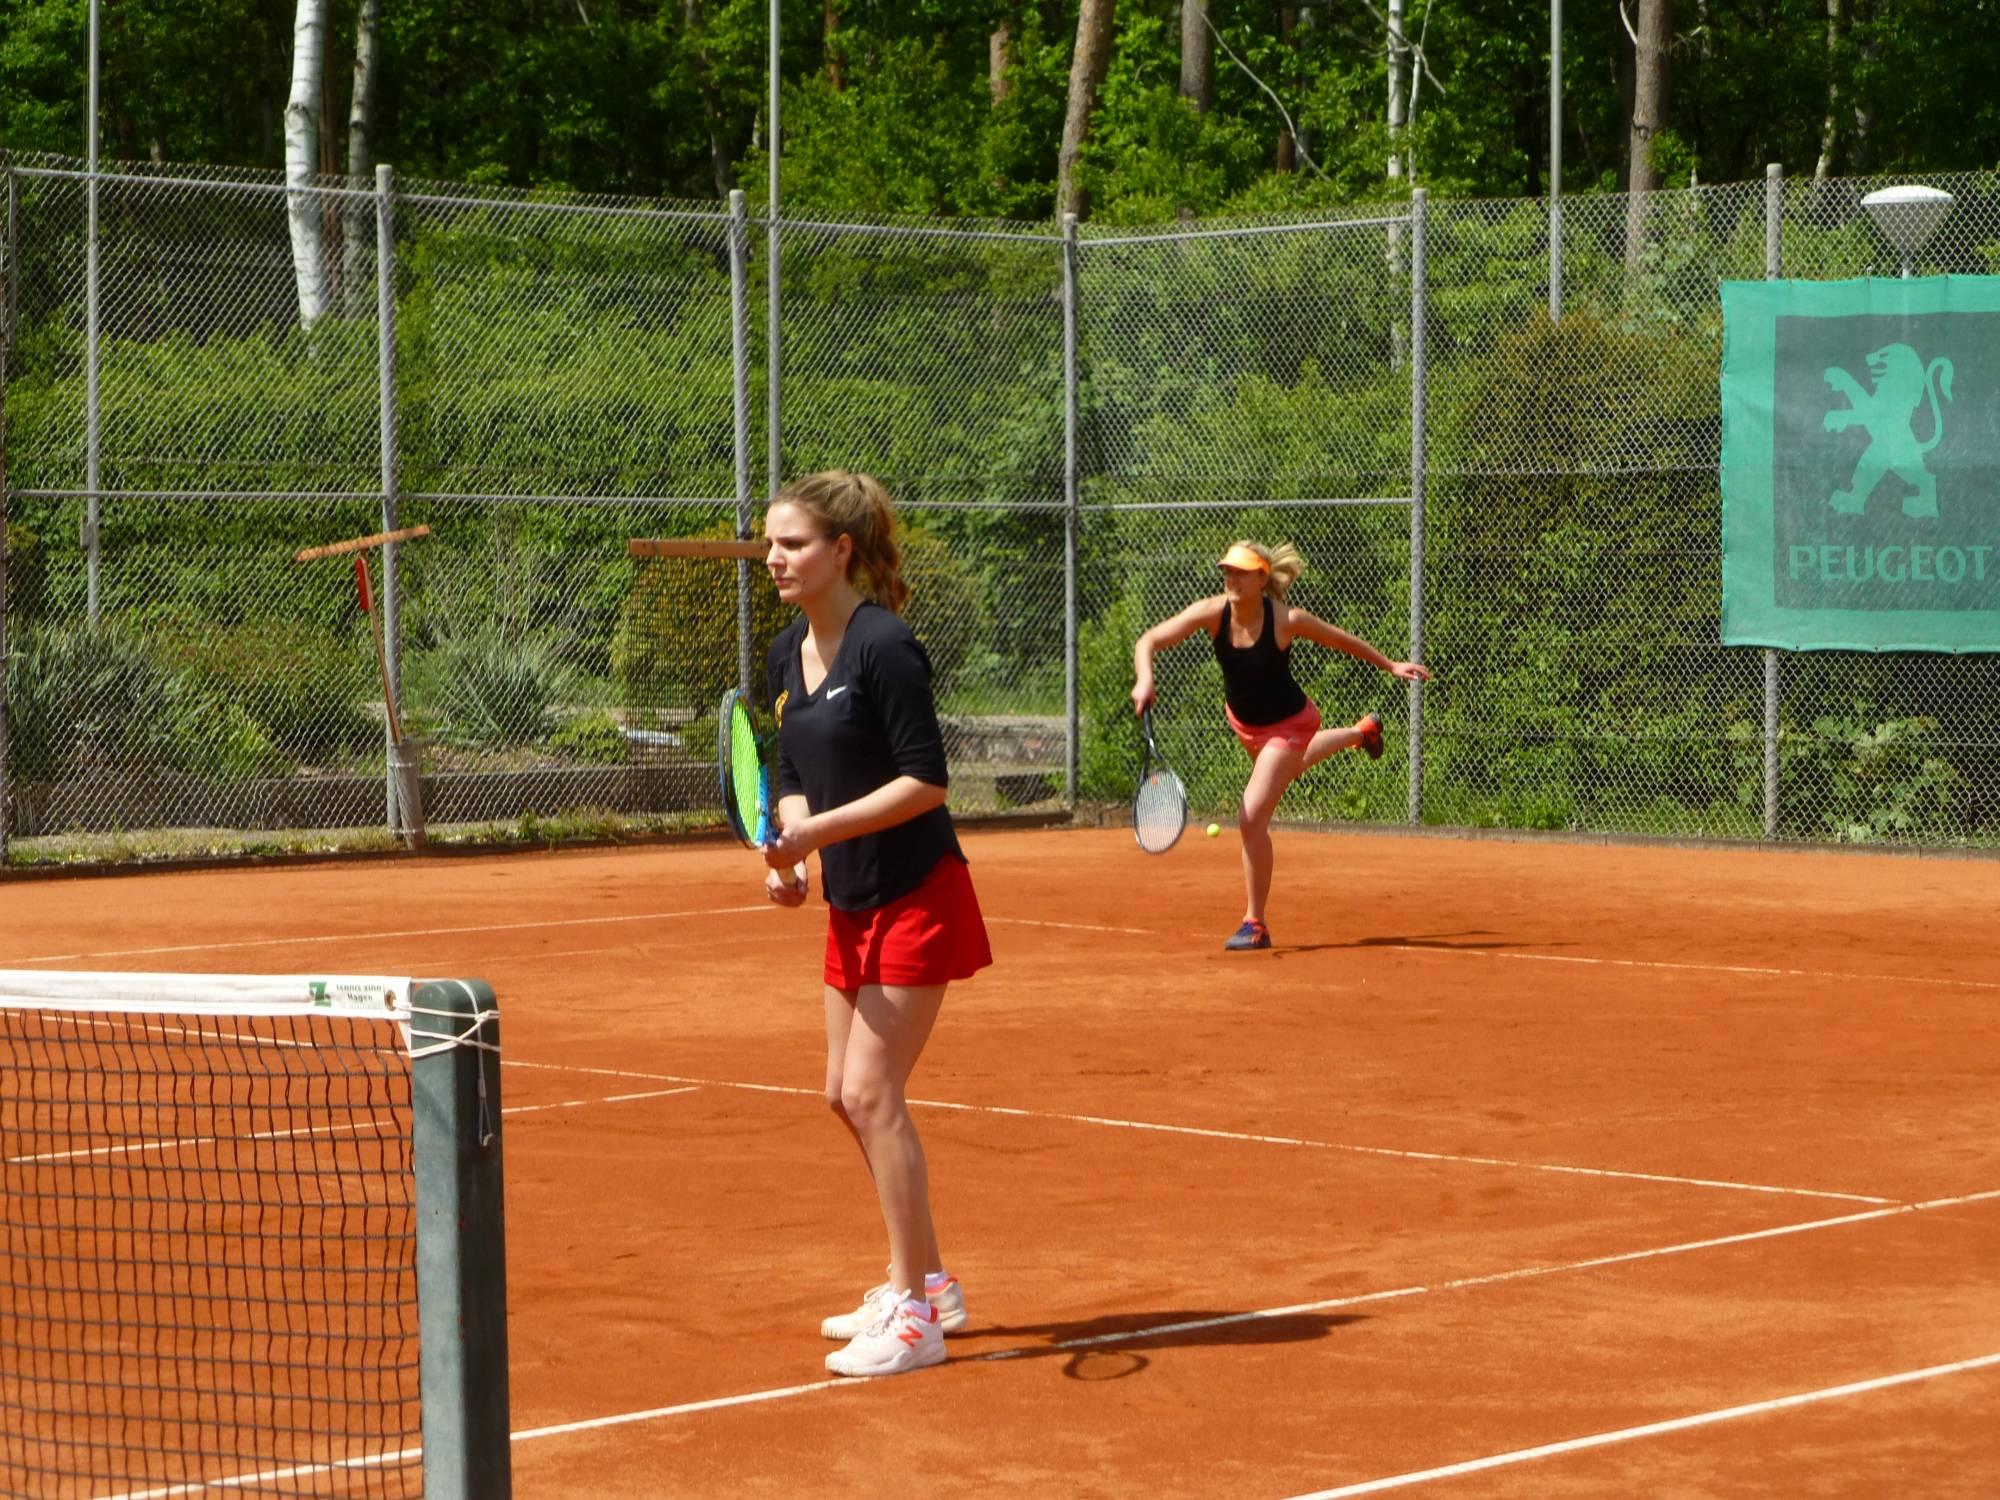 Foto-Spieler_Jana-Froelich+Maren-Randow_2019-05-12_1